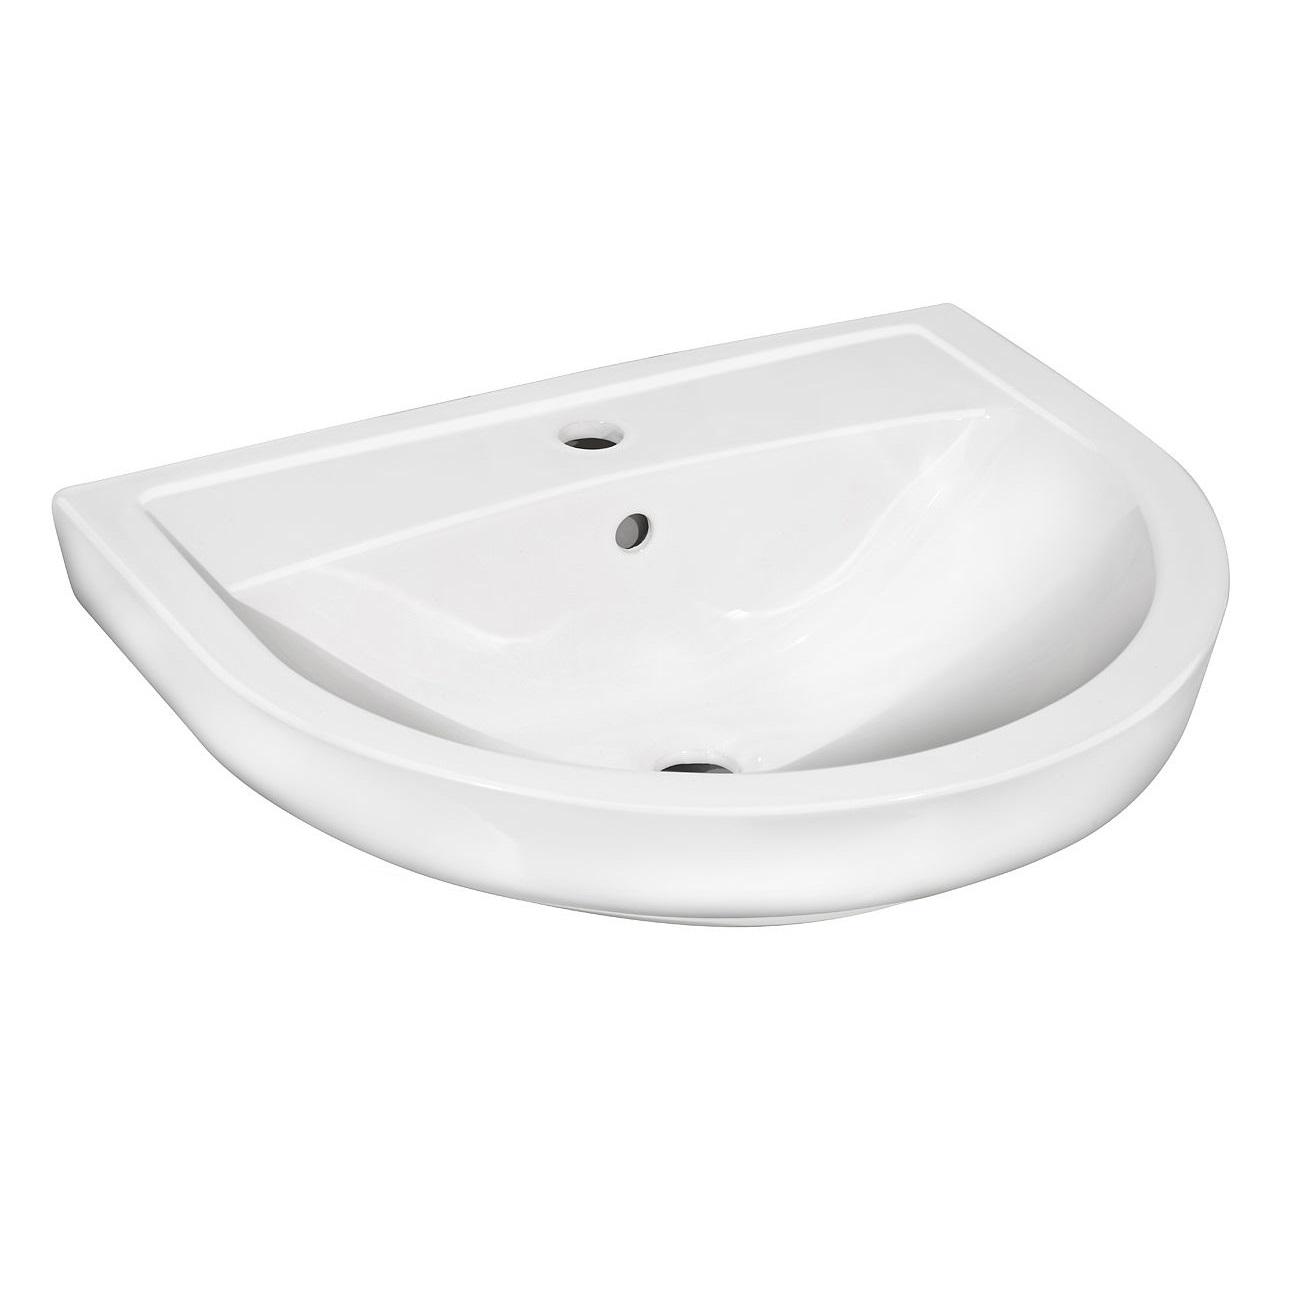 Tvättställ Gustavsberg Nordic3 410055 55 cm